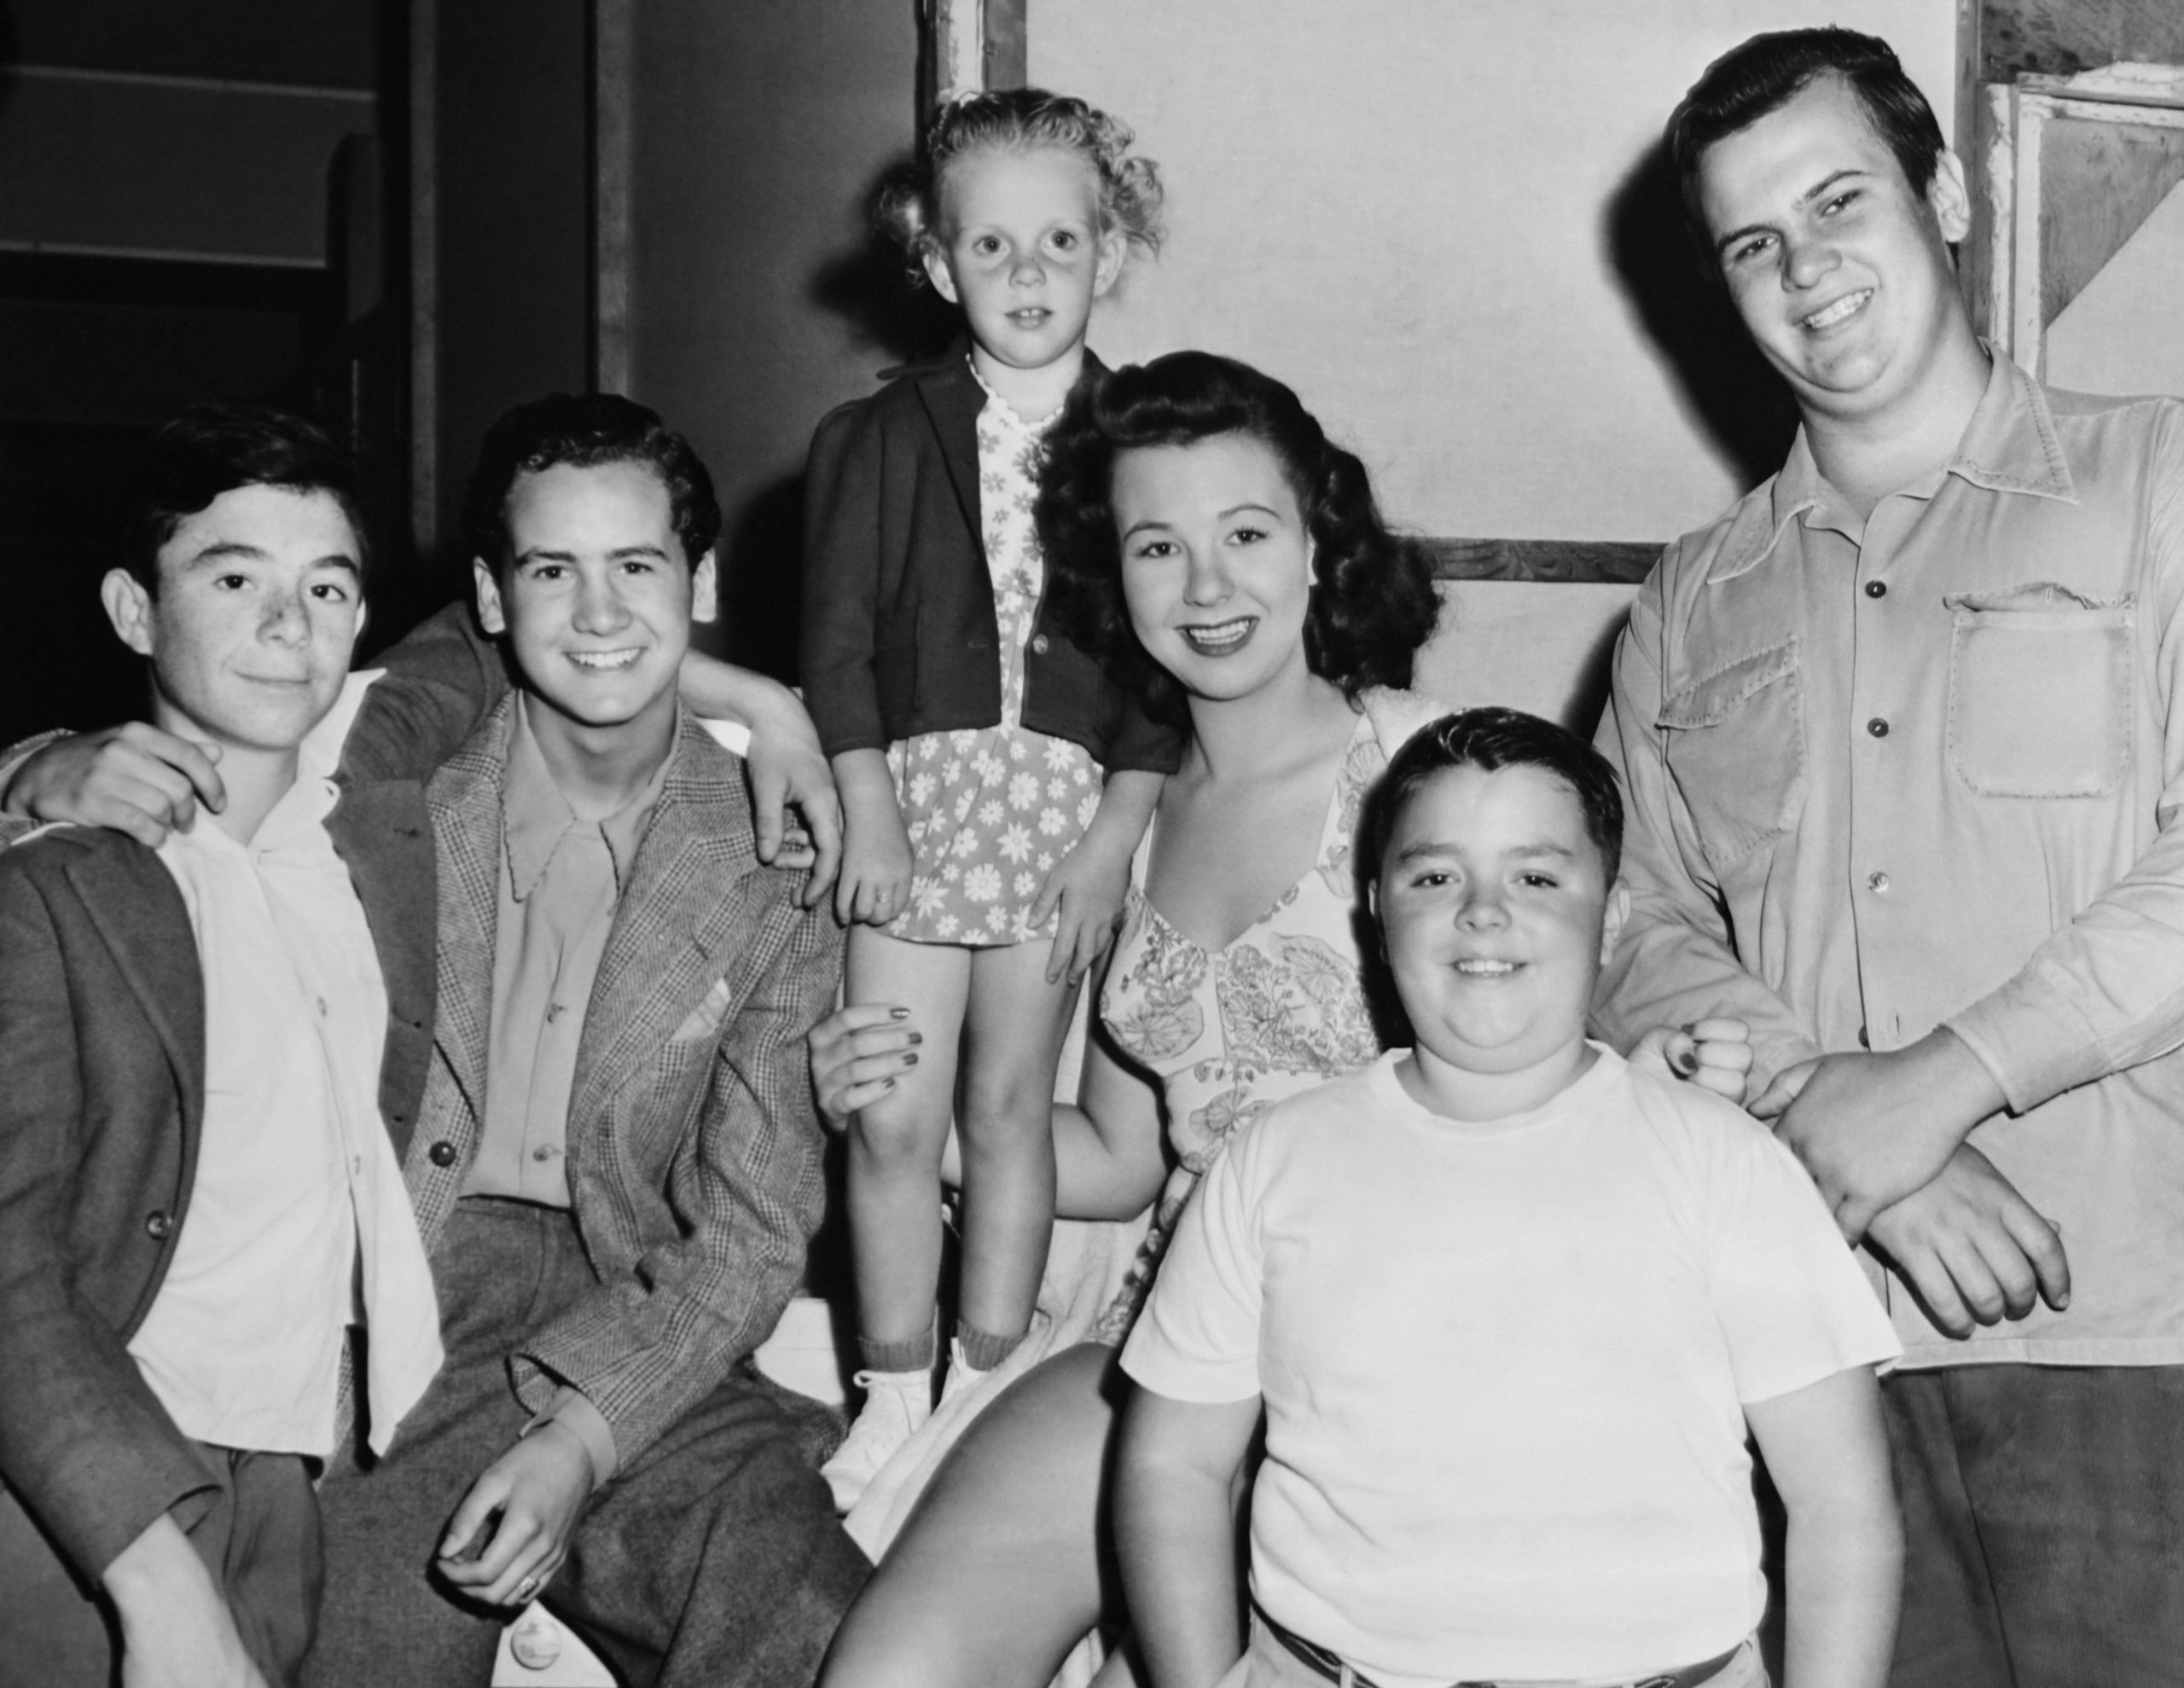 spanky-and-alfalfa-in-1942